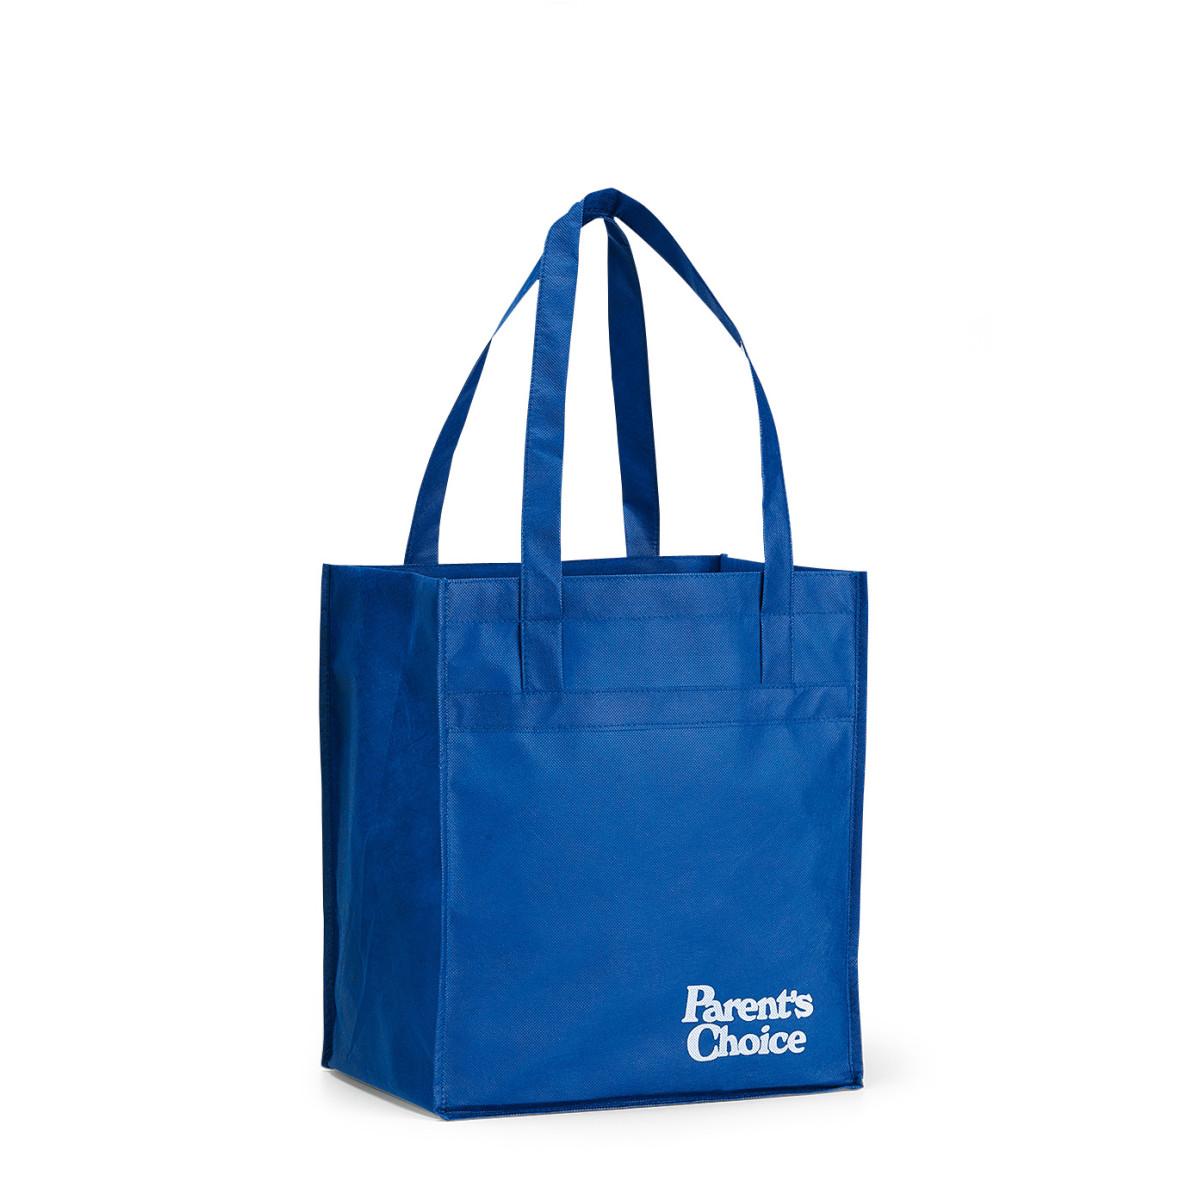 Gemline 1760 - Deluxe Grocery Shopper